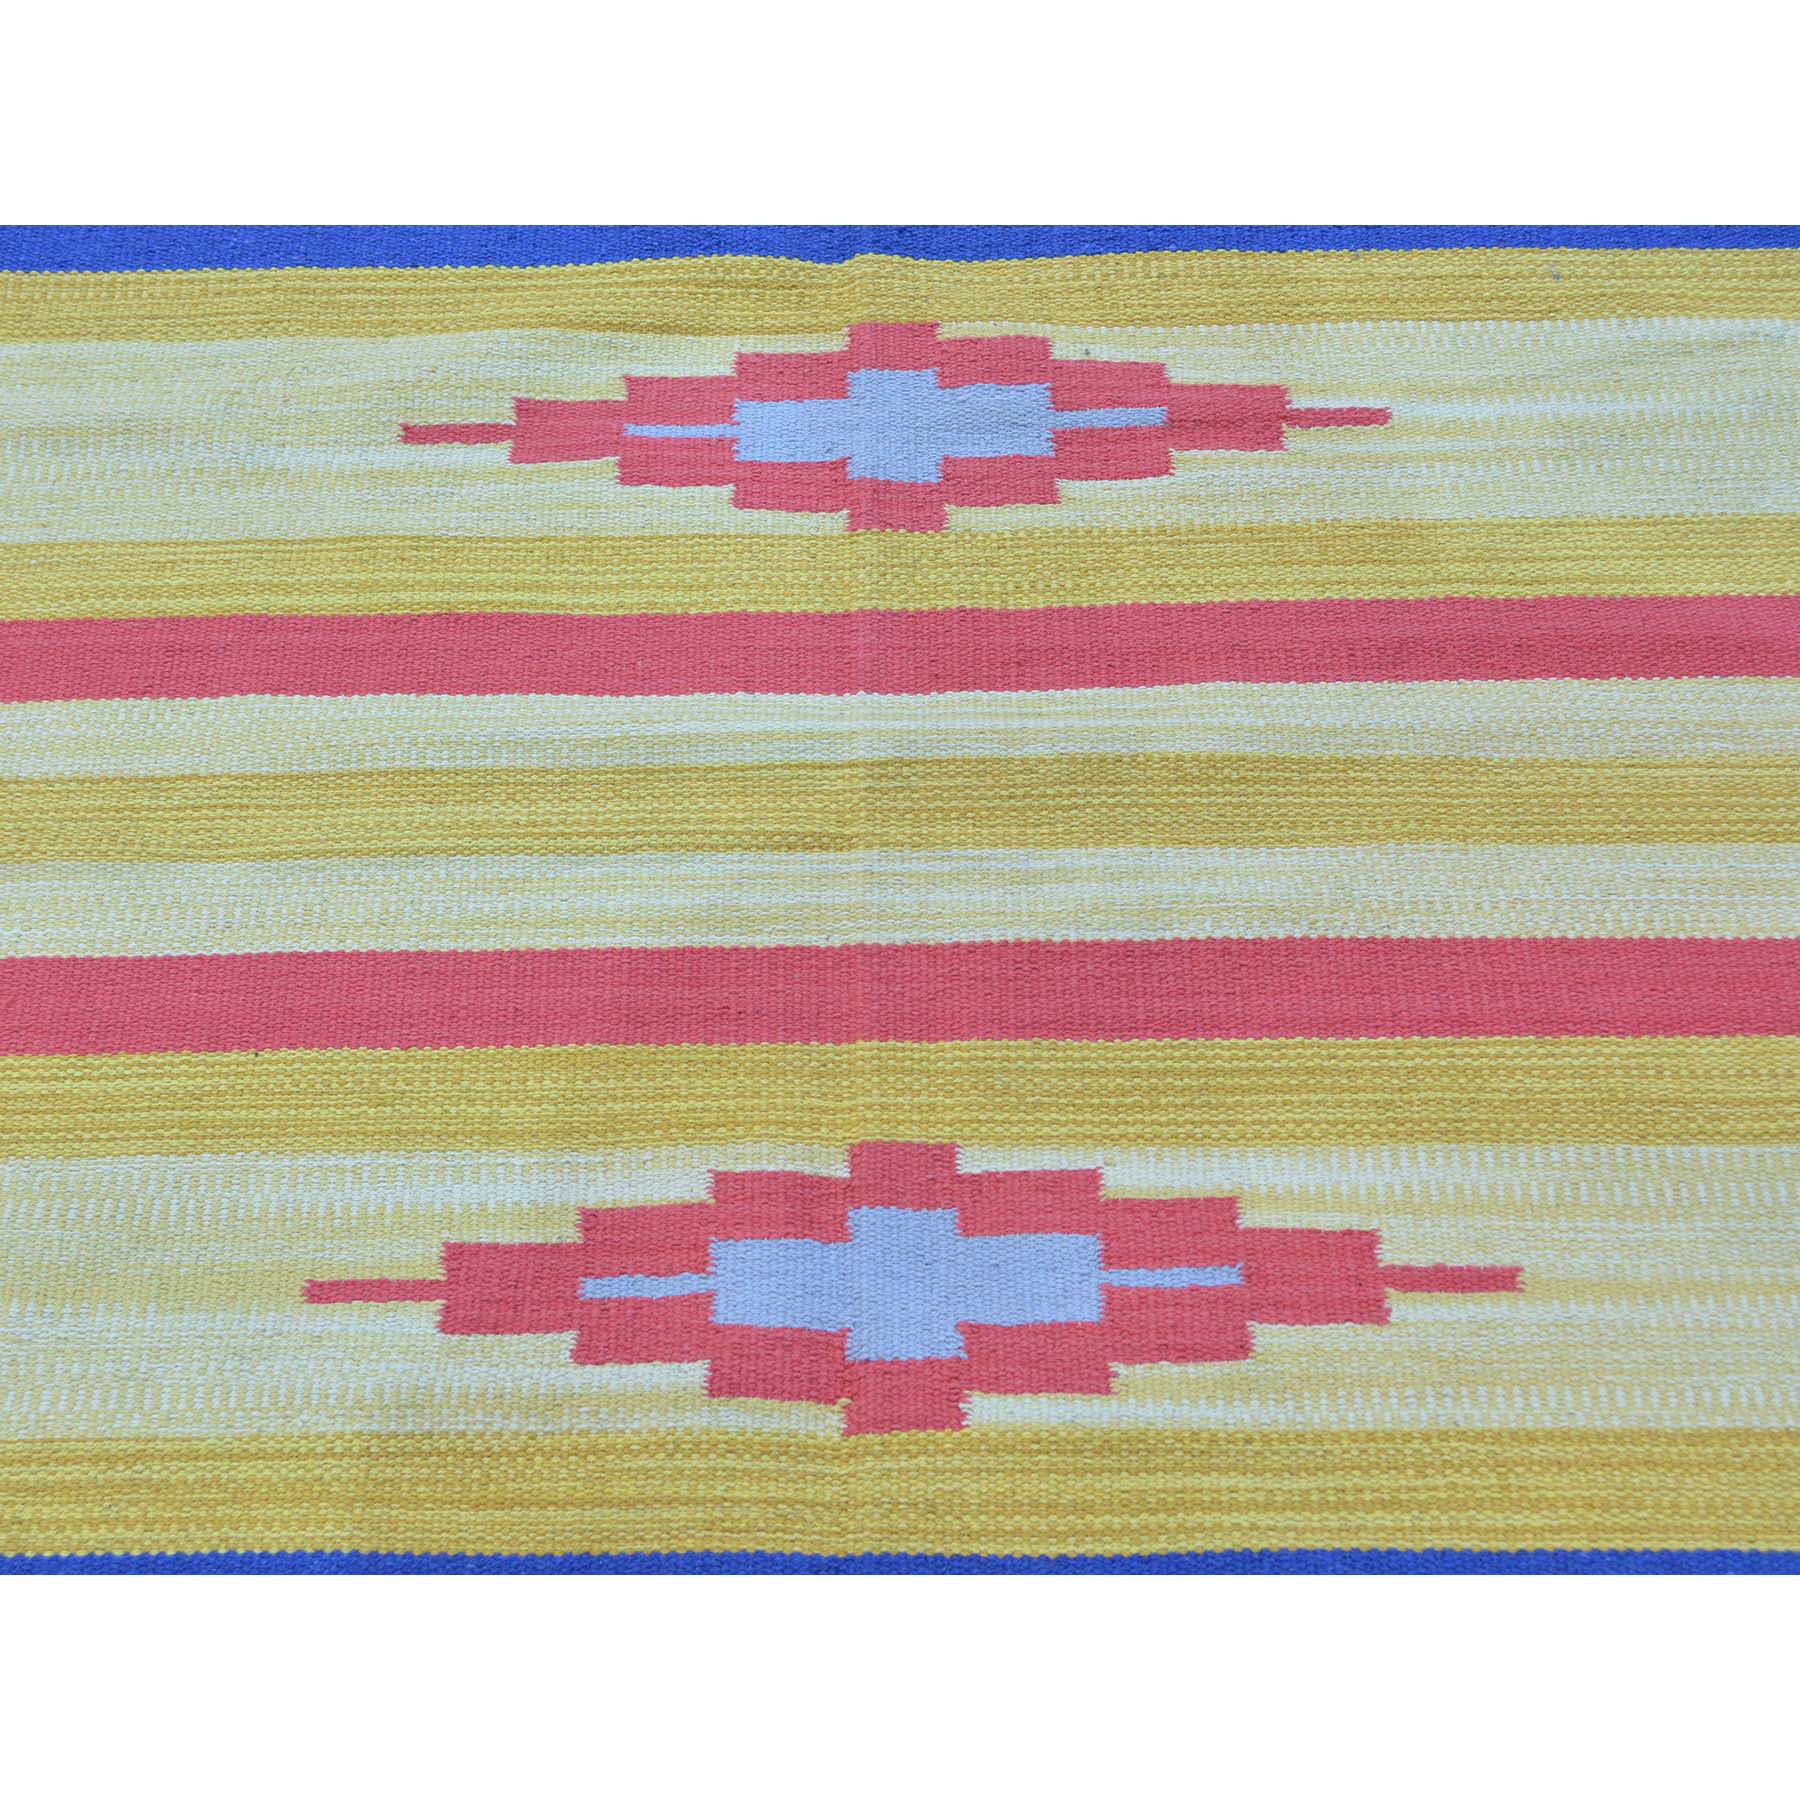 8-x8-4  Flat Weave Hand Woven Navajo Design Square Killim Rug